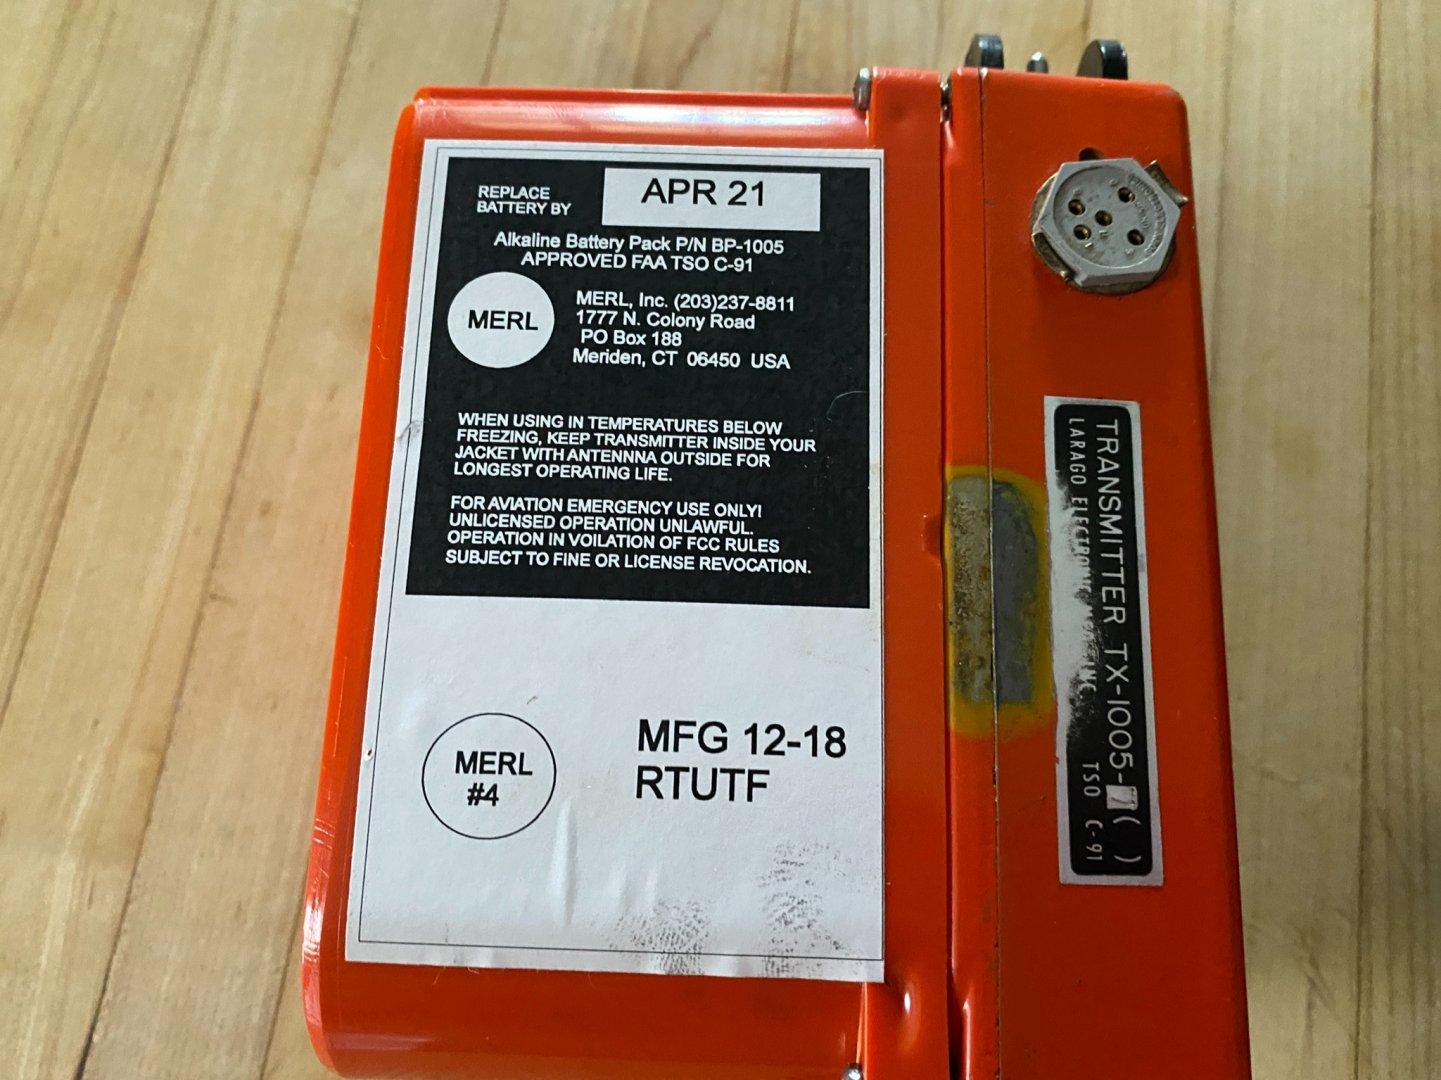 F5E0D520-DA30-454B-803D-3831BA2D24C5.jpeg